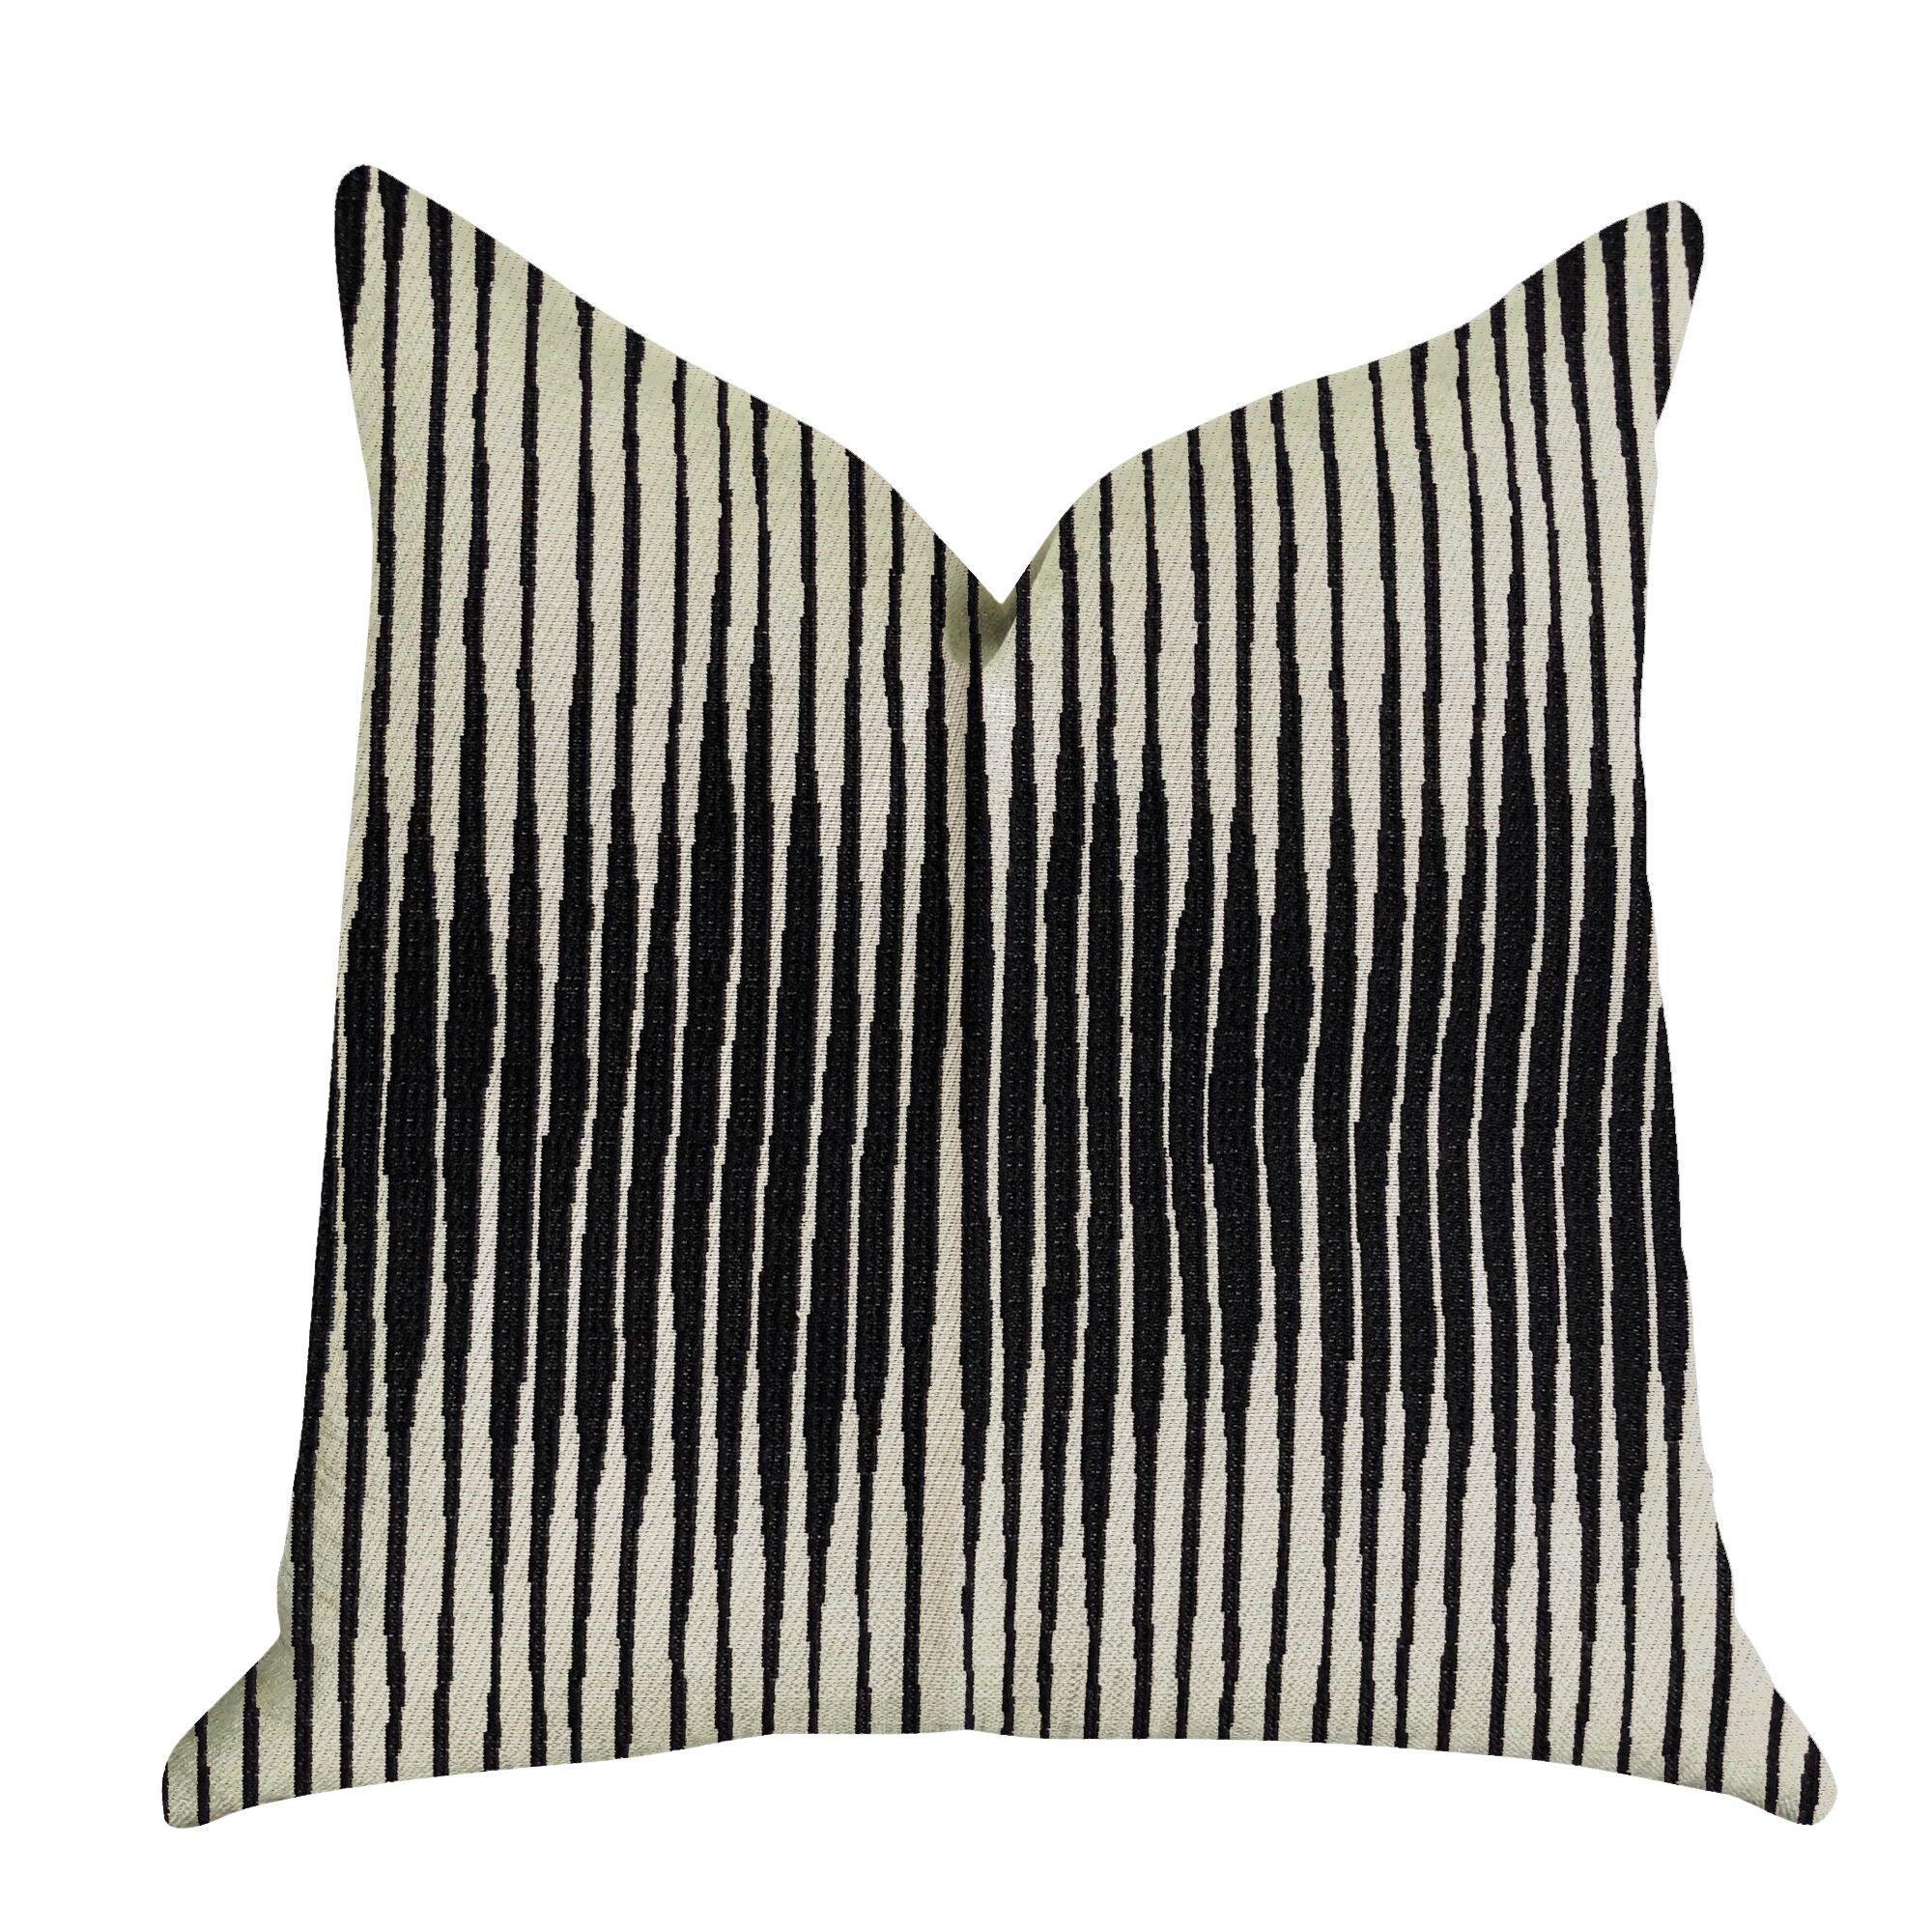 Tabatha Luxury Pillow Size: 22